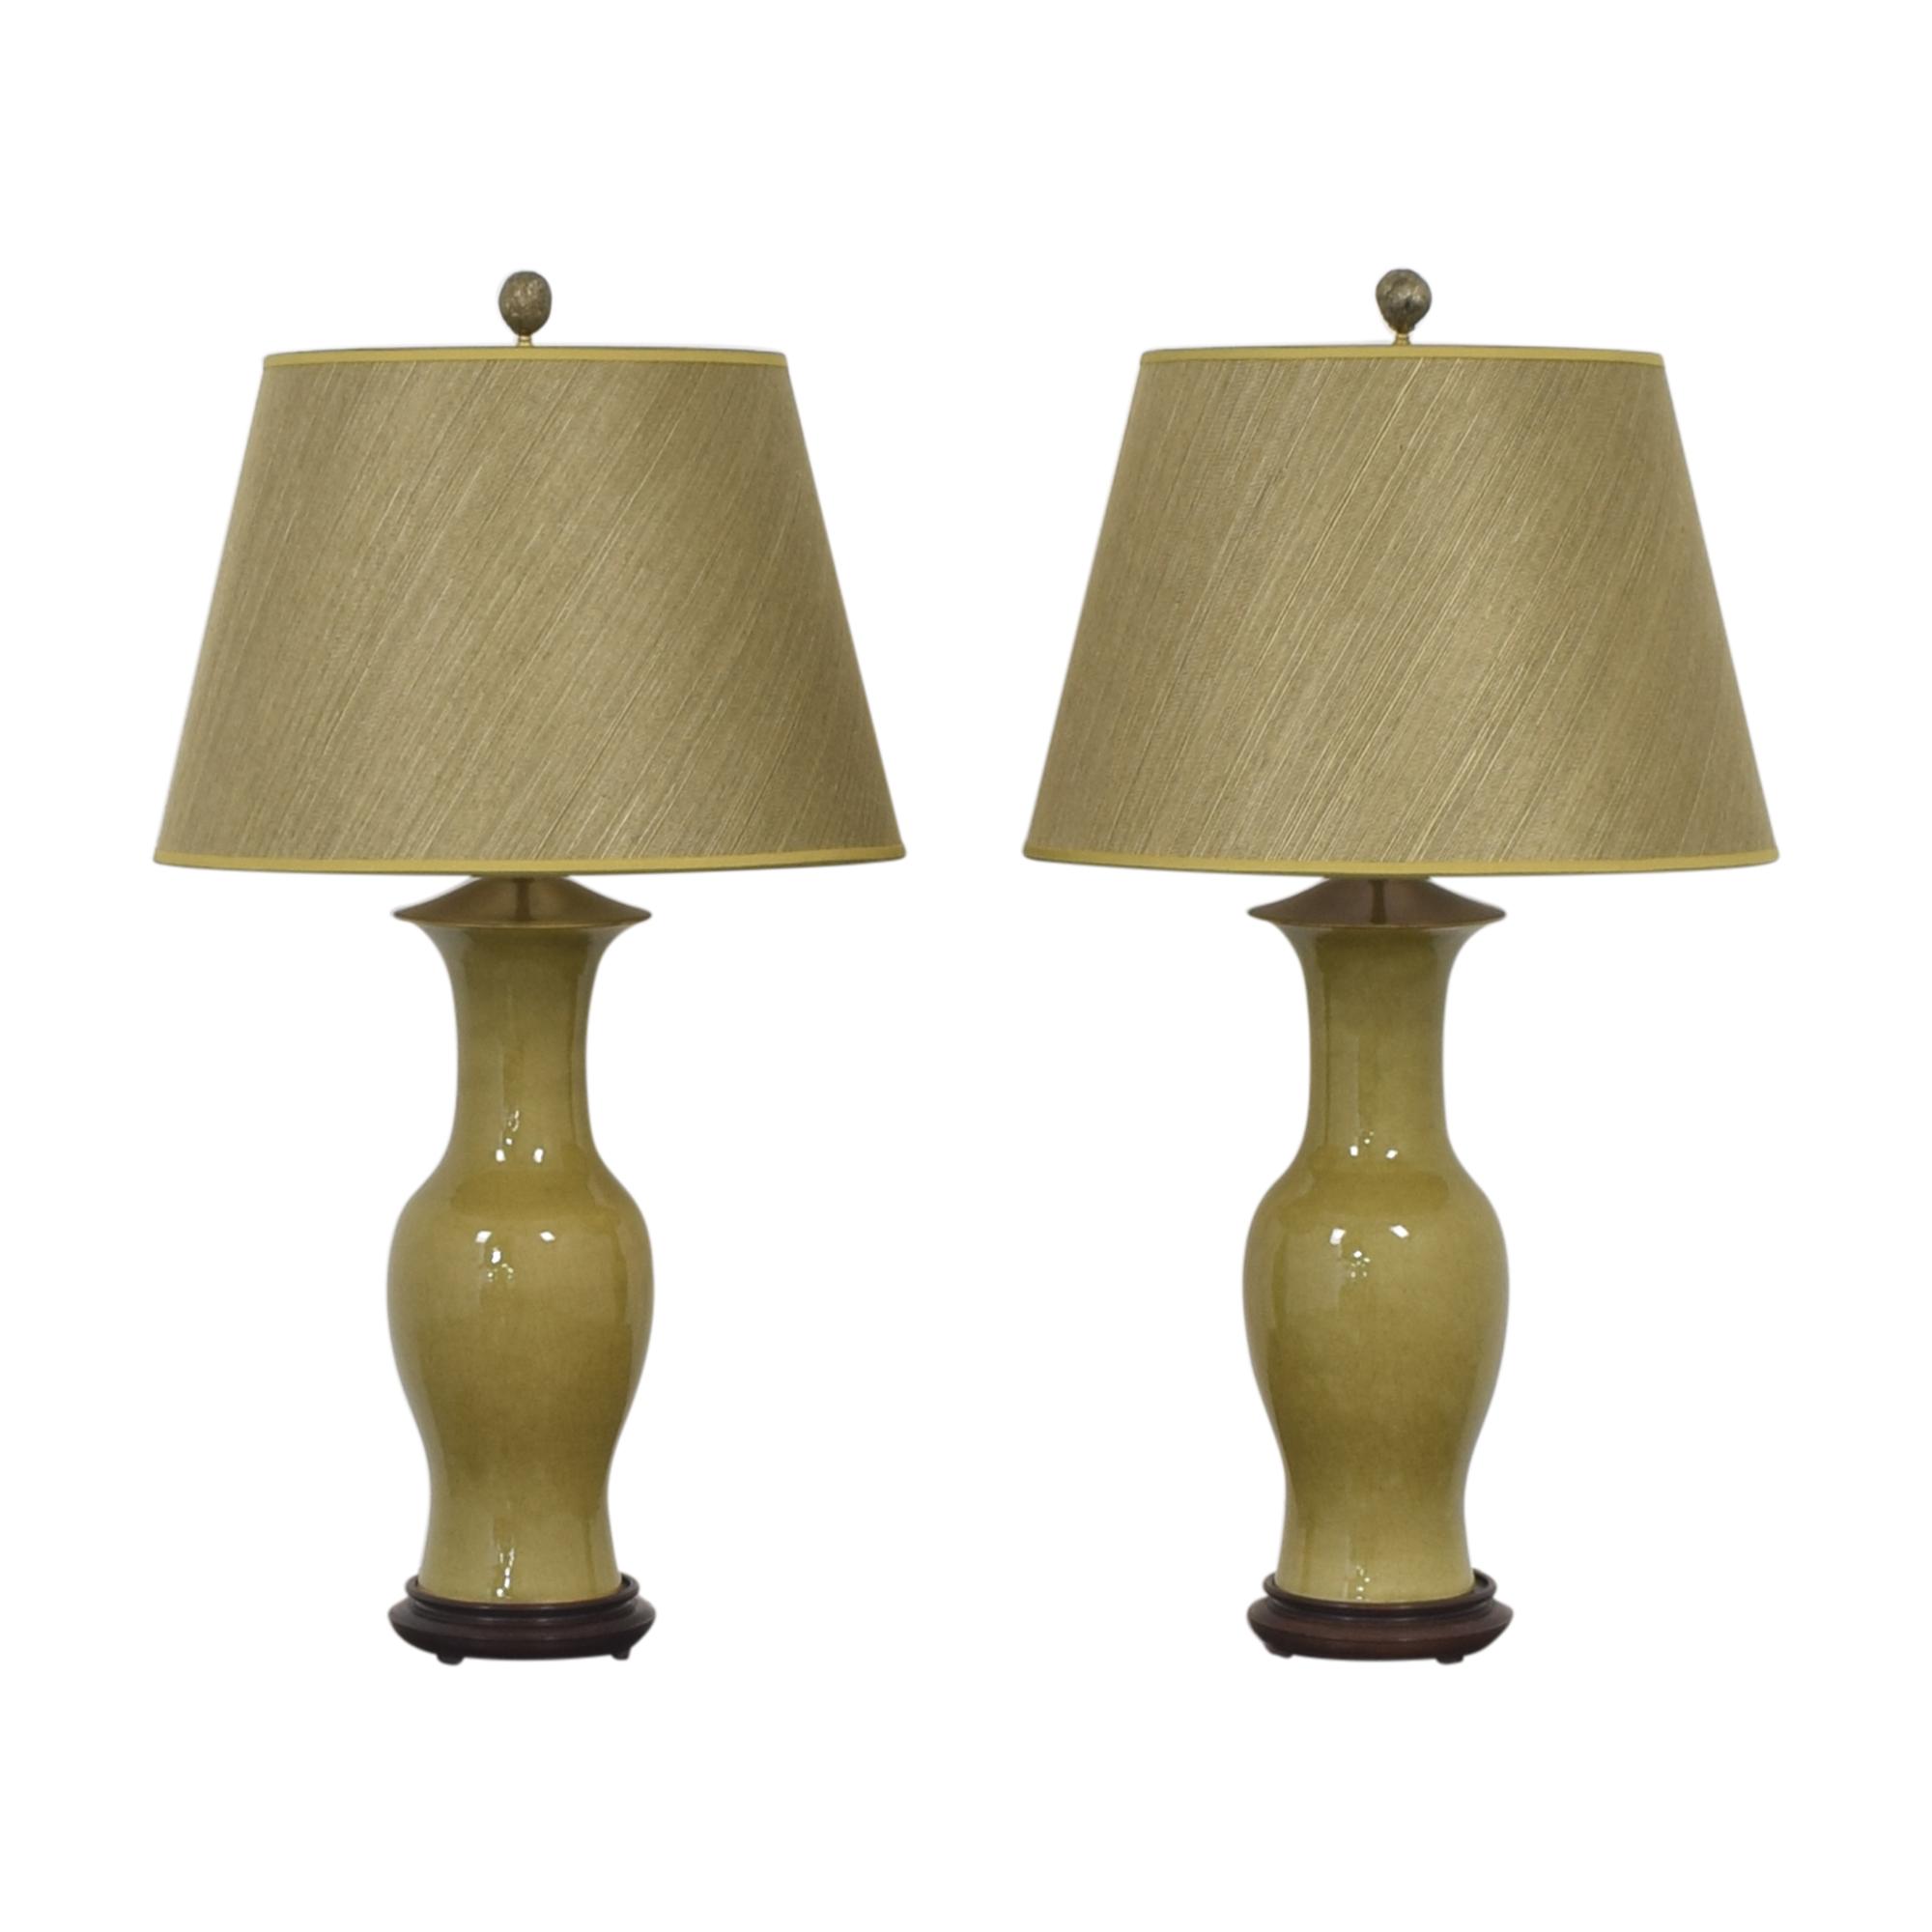 Warren Kessler Warren Kessler Urn Table Lamps Lamps